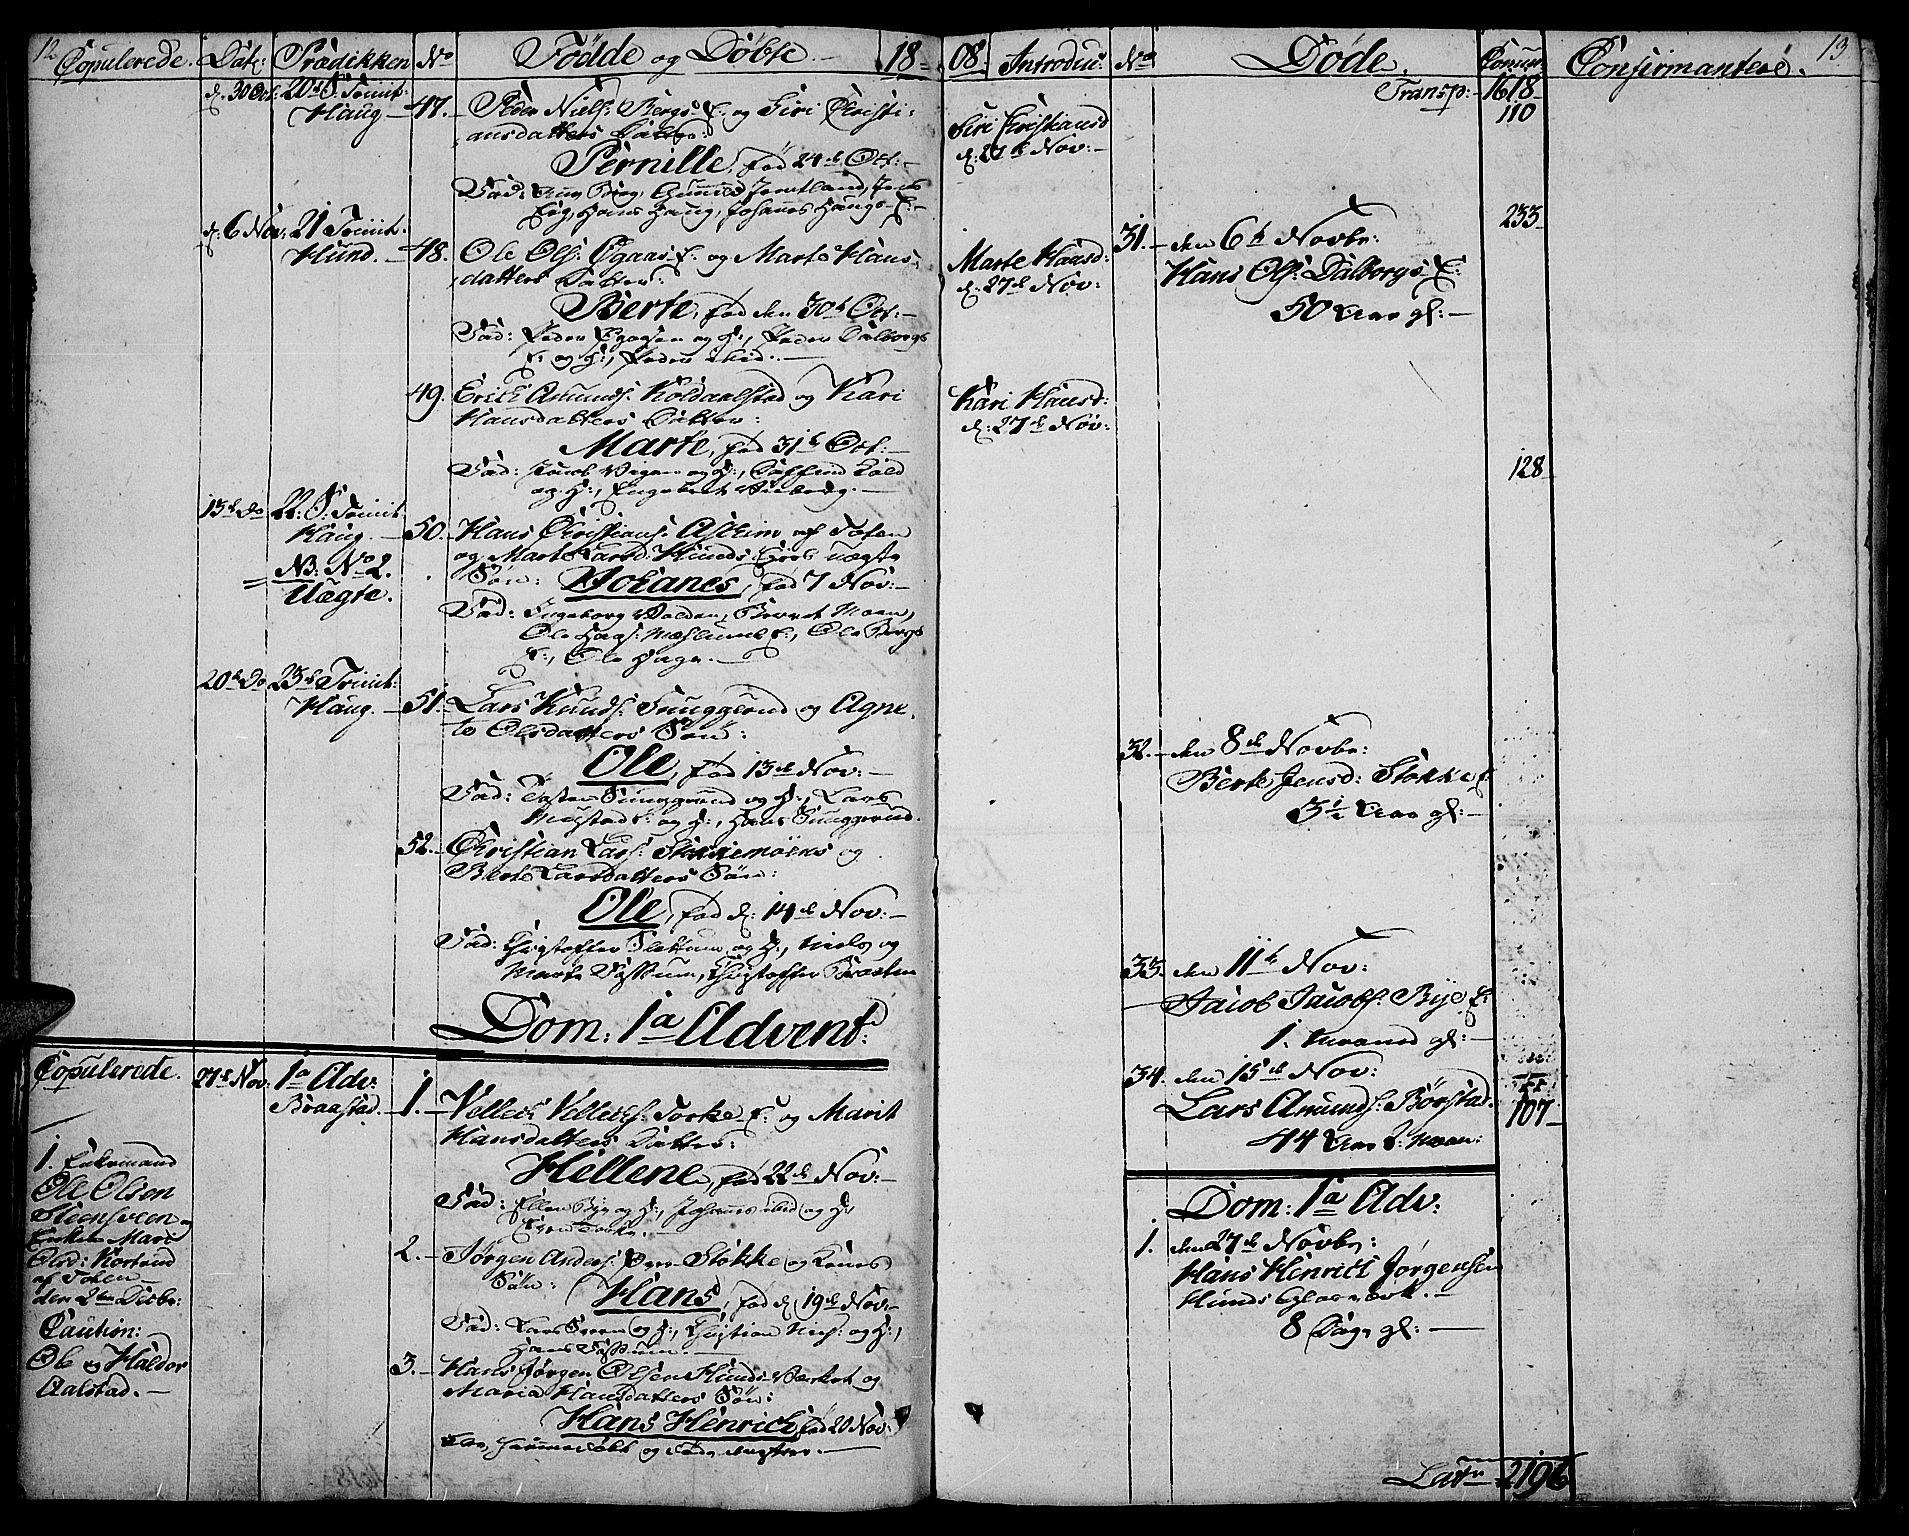 SAH, Vardal prestekontor, H/Ha/Haa/L0003: Ministerialbok nr. 3, 1808-1814, s. 12-13